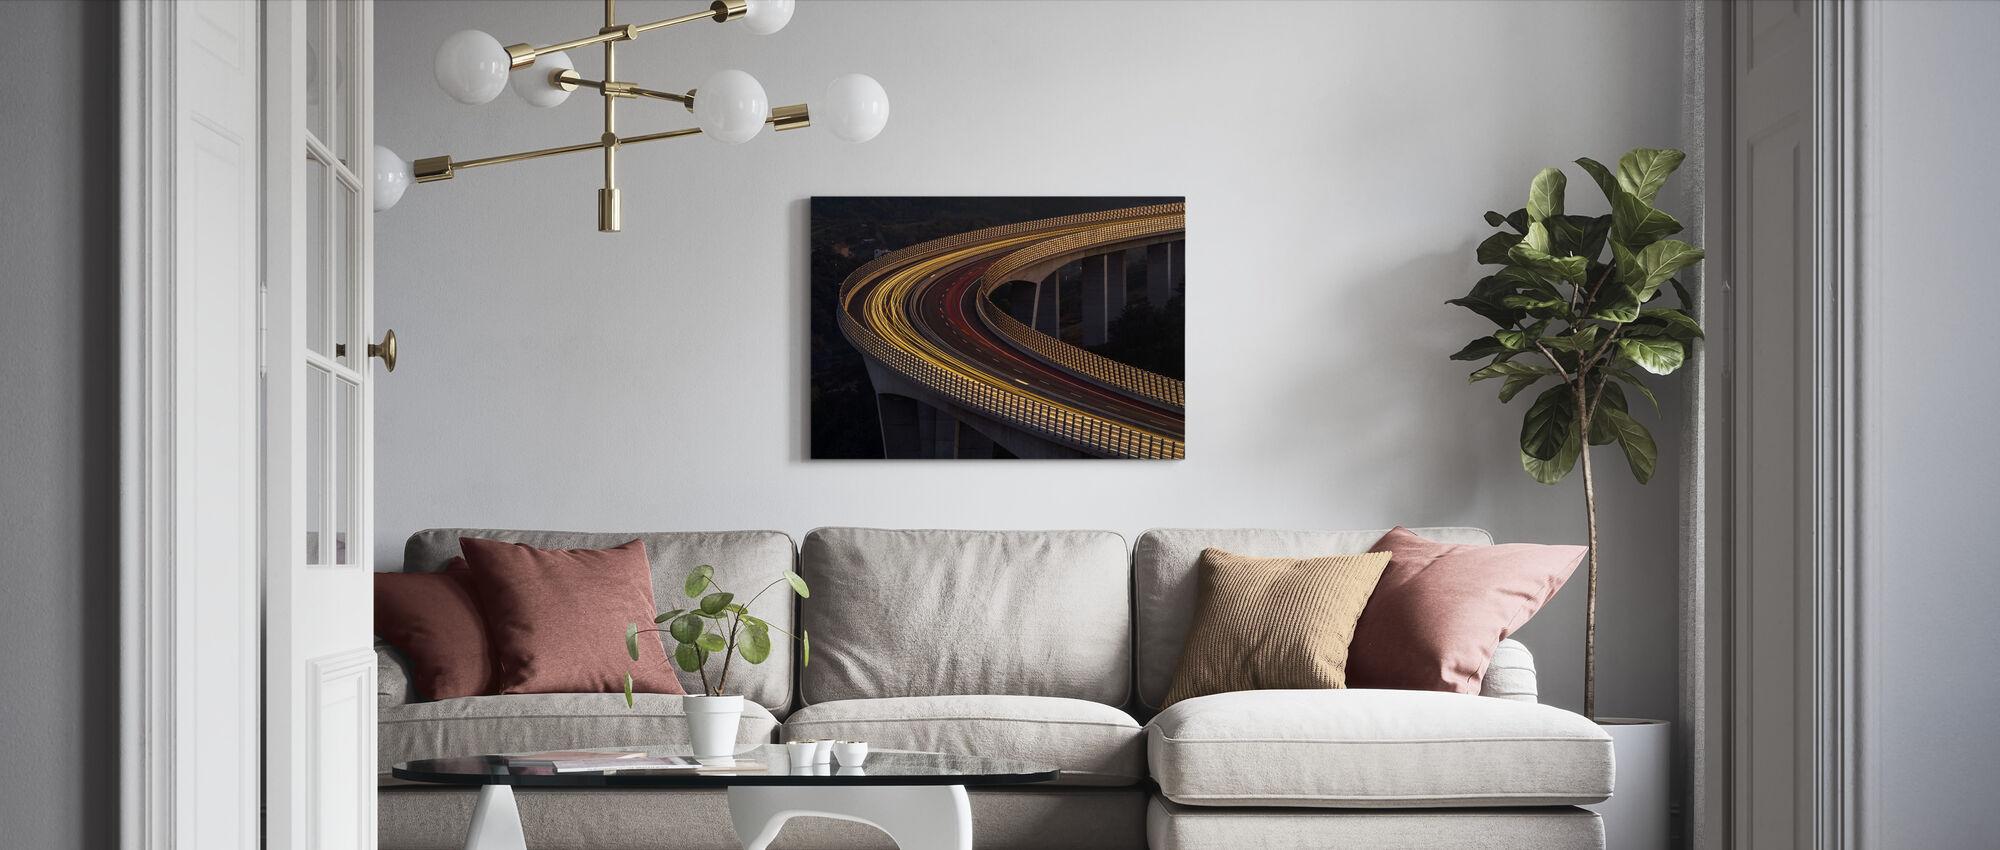 Viadukt Crni Kal - Canvas print - Living Room